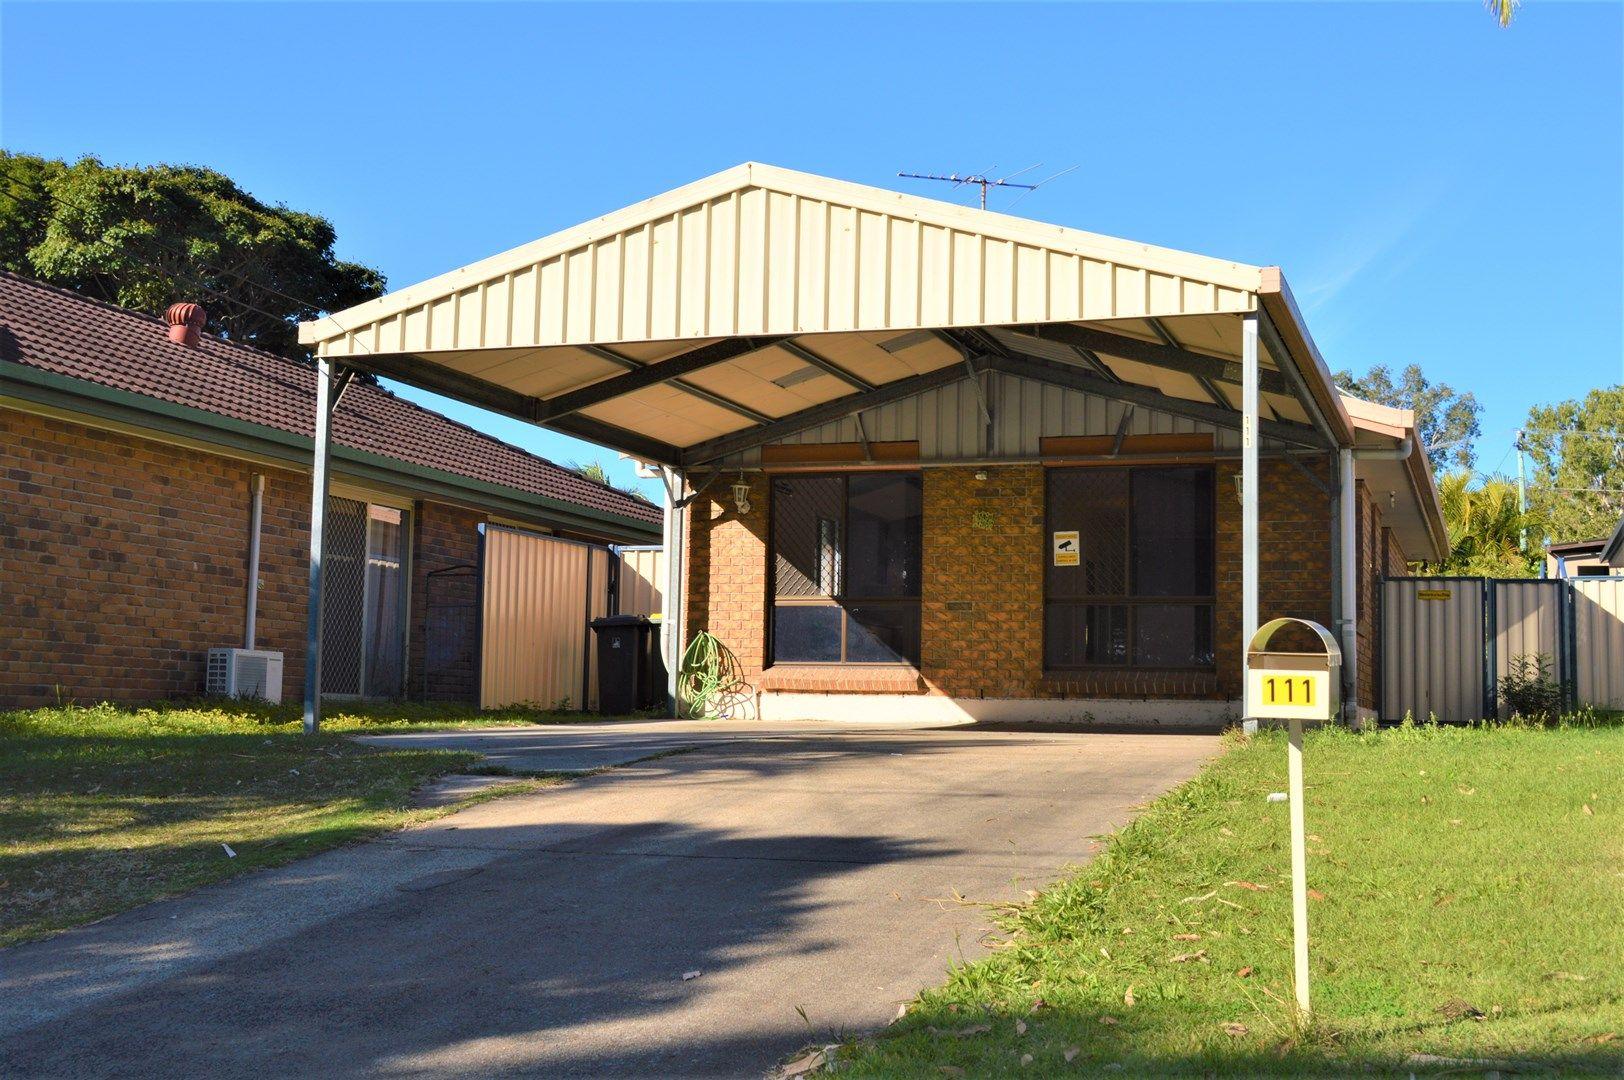 111 Landseer Street, Sunnybank Hills QLD 4109, Image 0